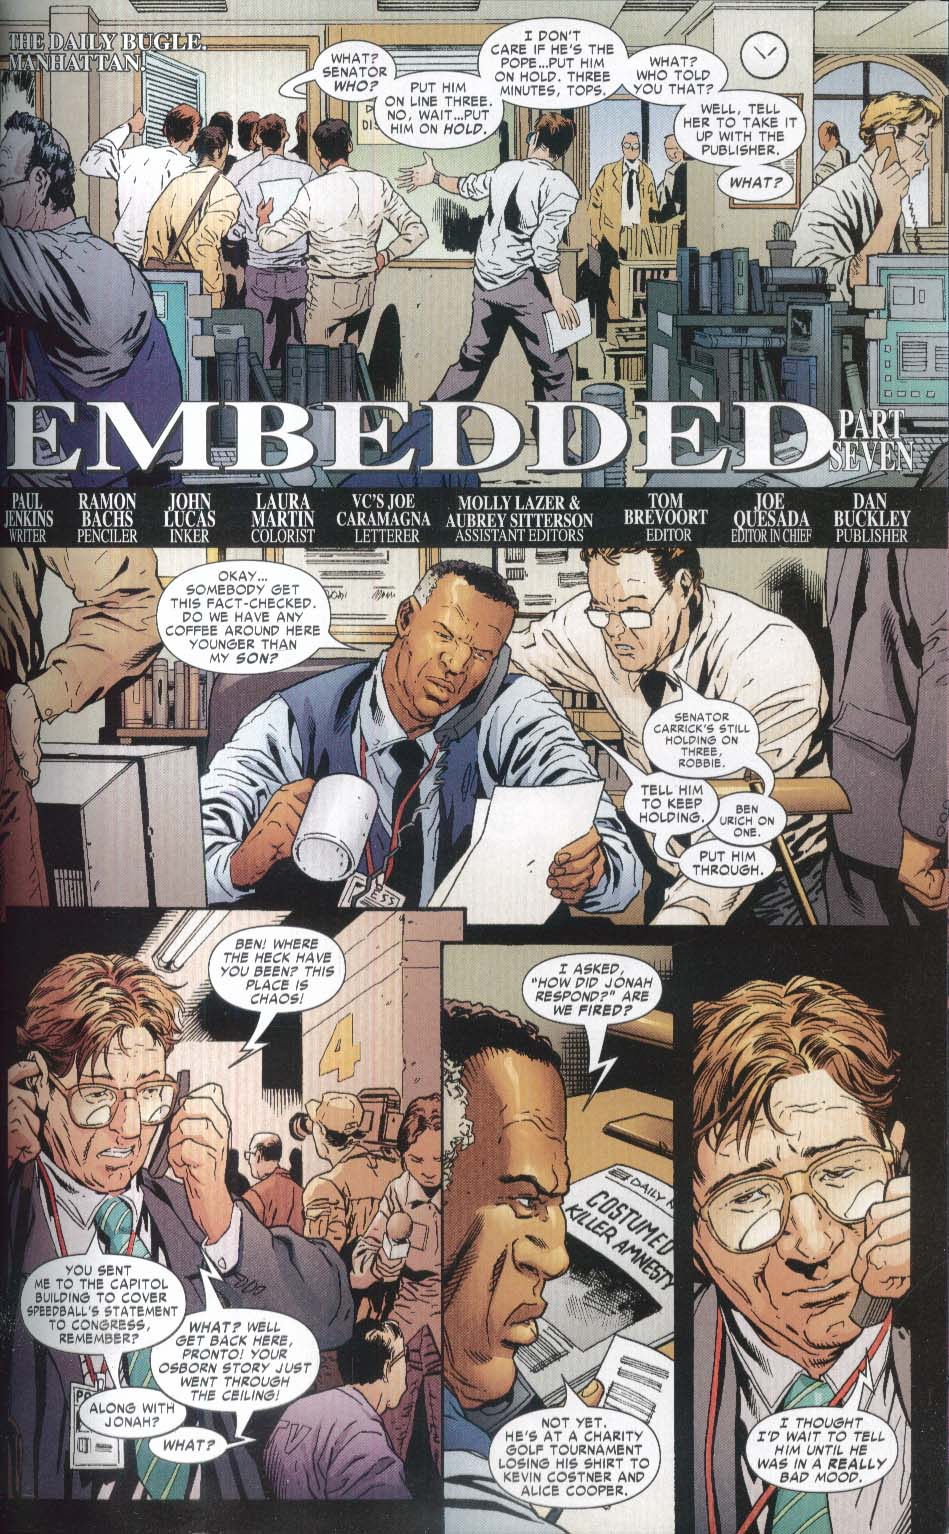 CIVIL WAR Front Line #2 Marvel Graphic Novel 1st Printing 2007